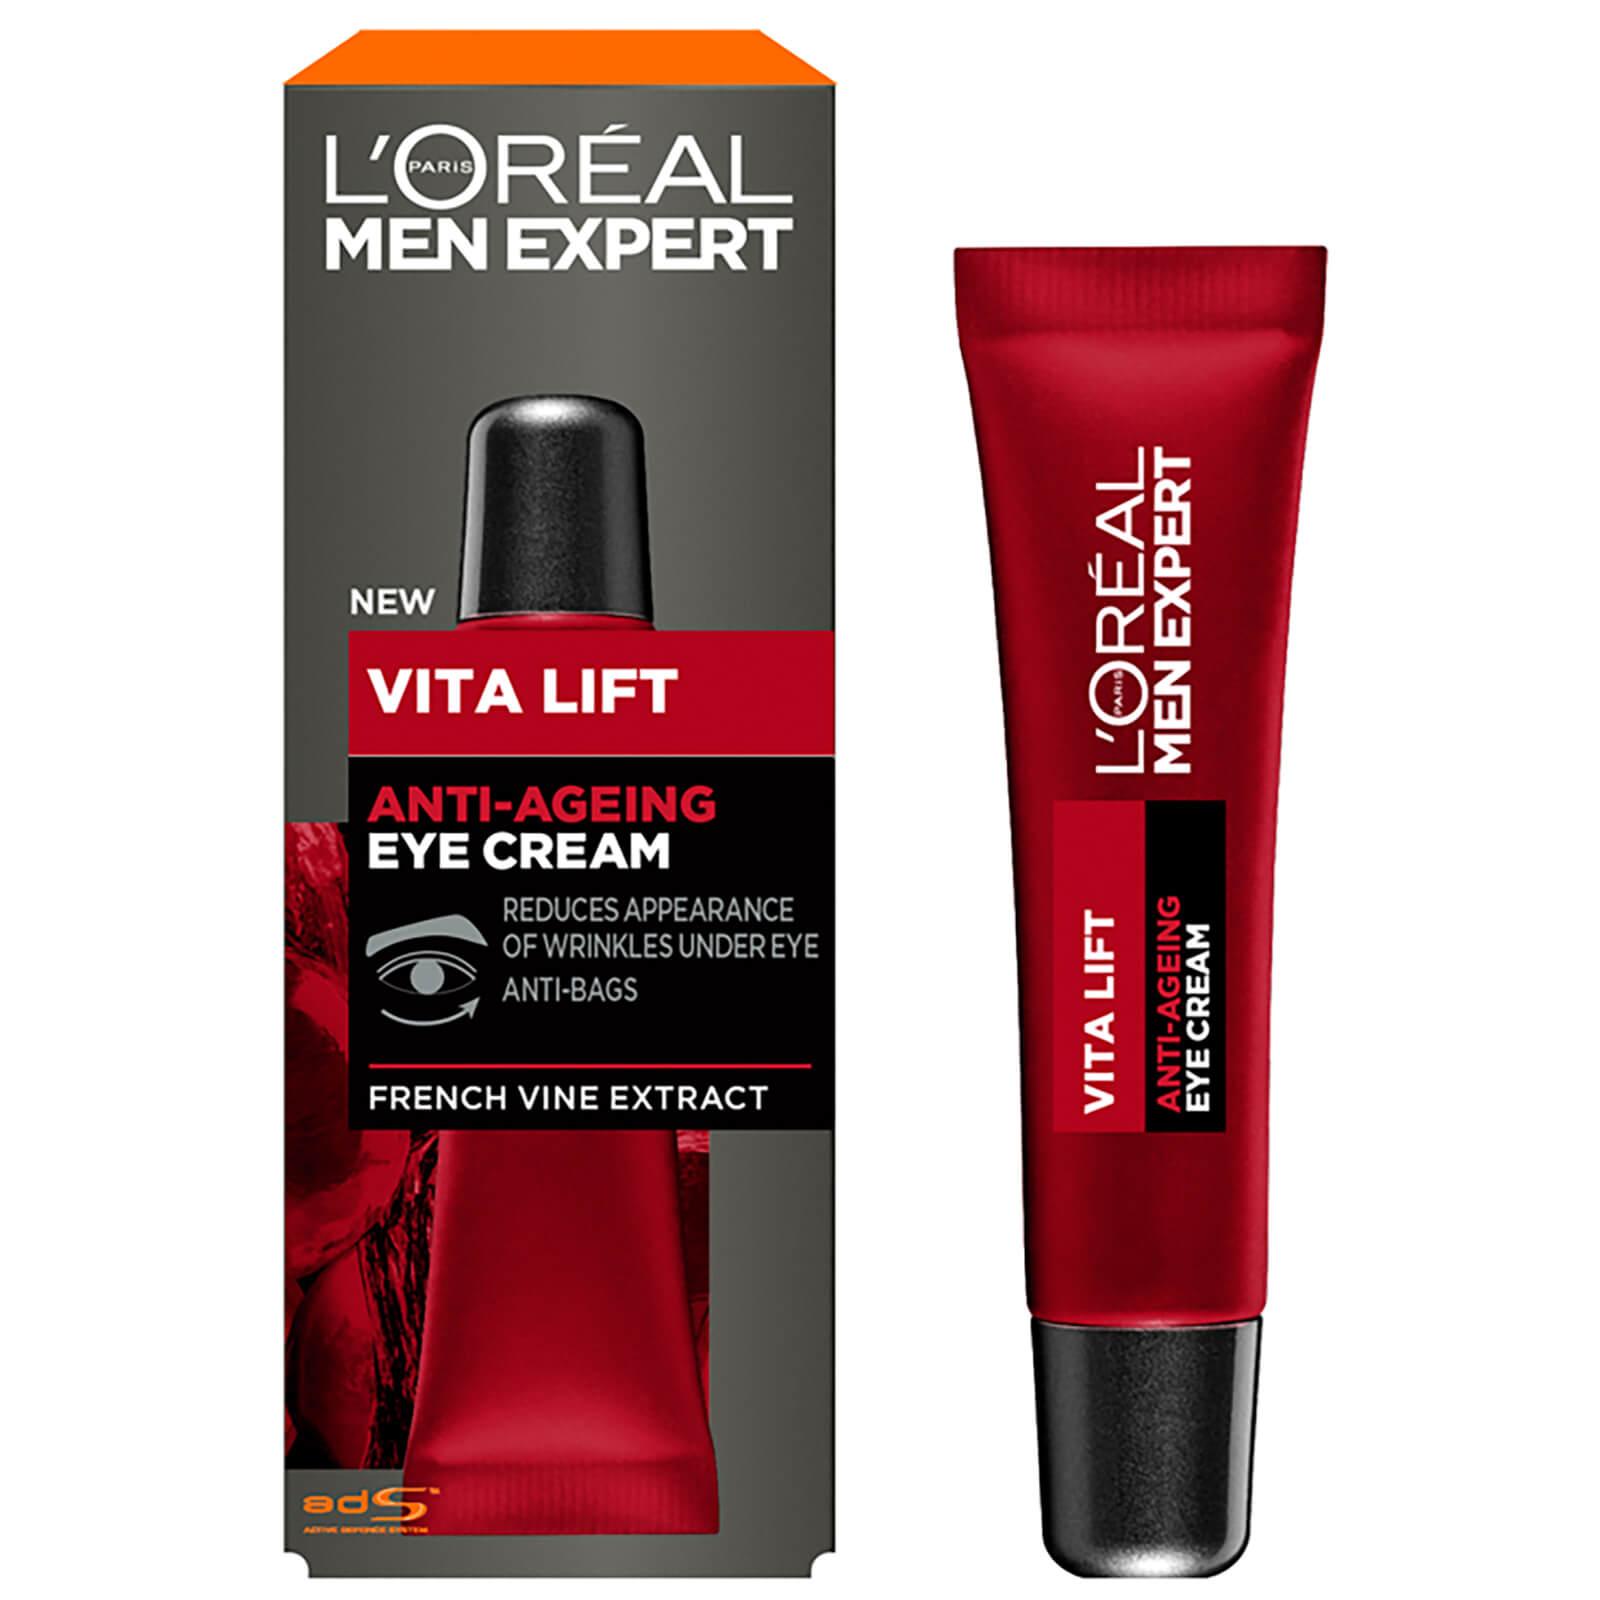 L'Oréal Paris Men Expert Vitalift Anti-Wrinkle Eye Cream 15ml